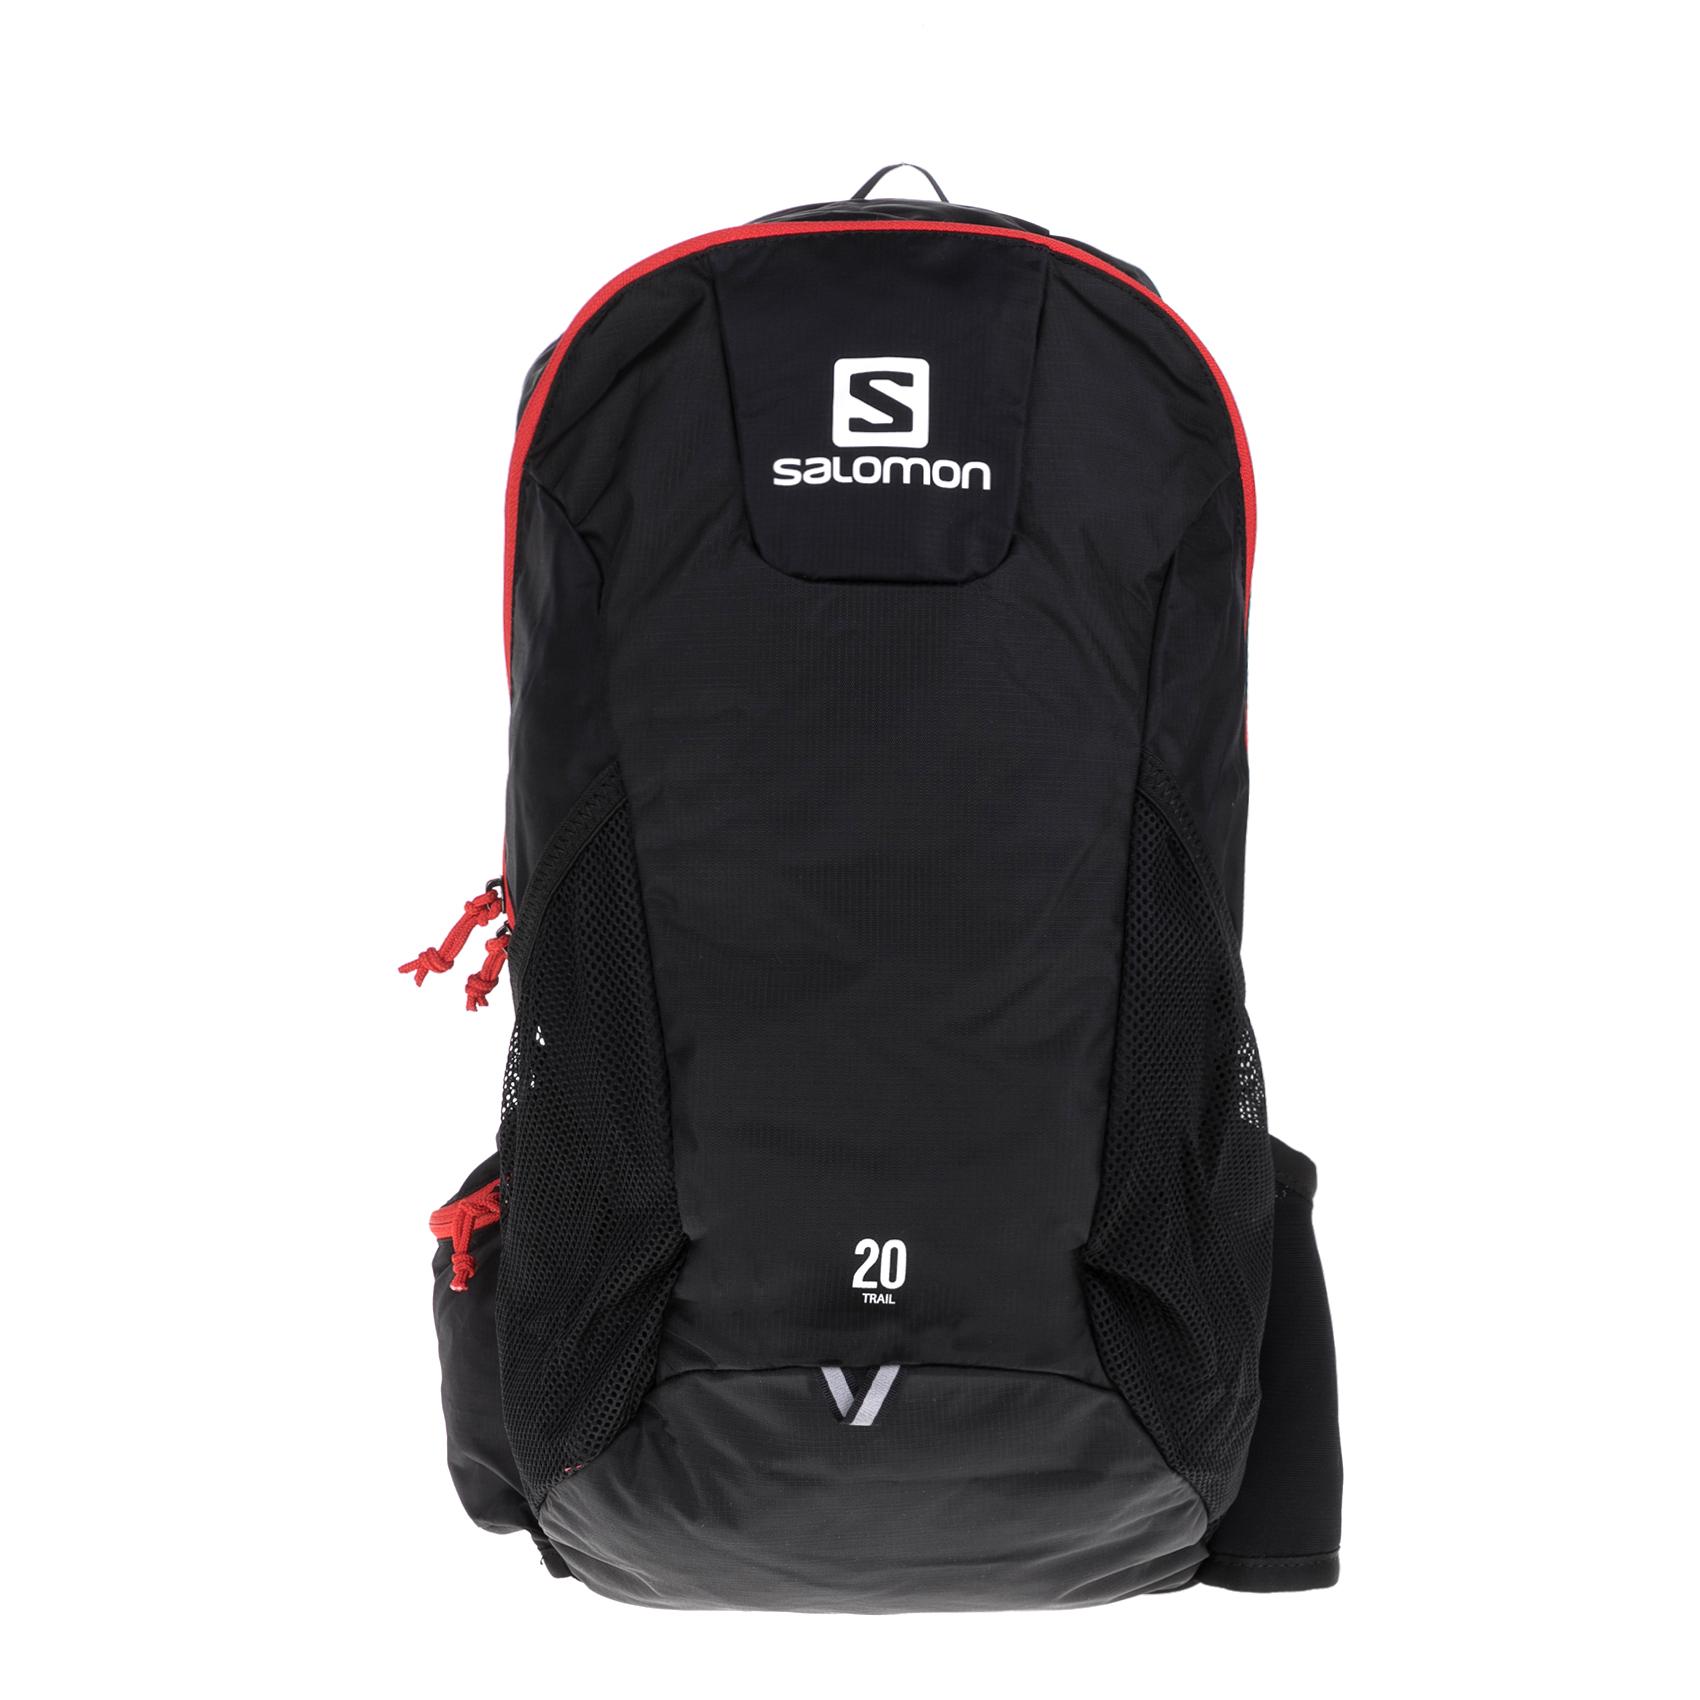 SALOMON – Σακίδιο πλάτης SALOMON PACKS BAG TRAIL 20 B μαύρο-κόκκινο